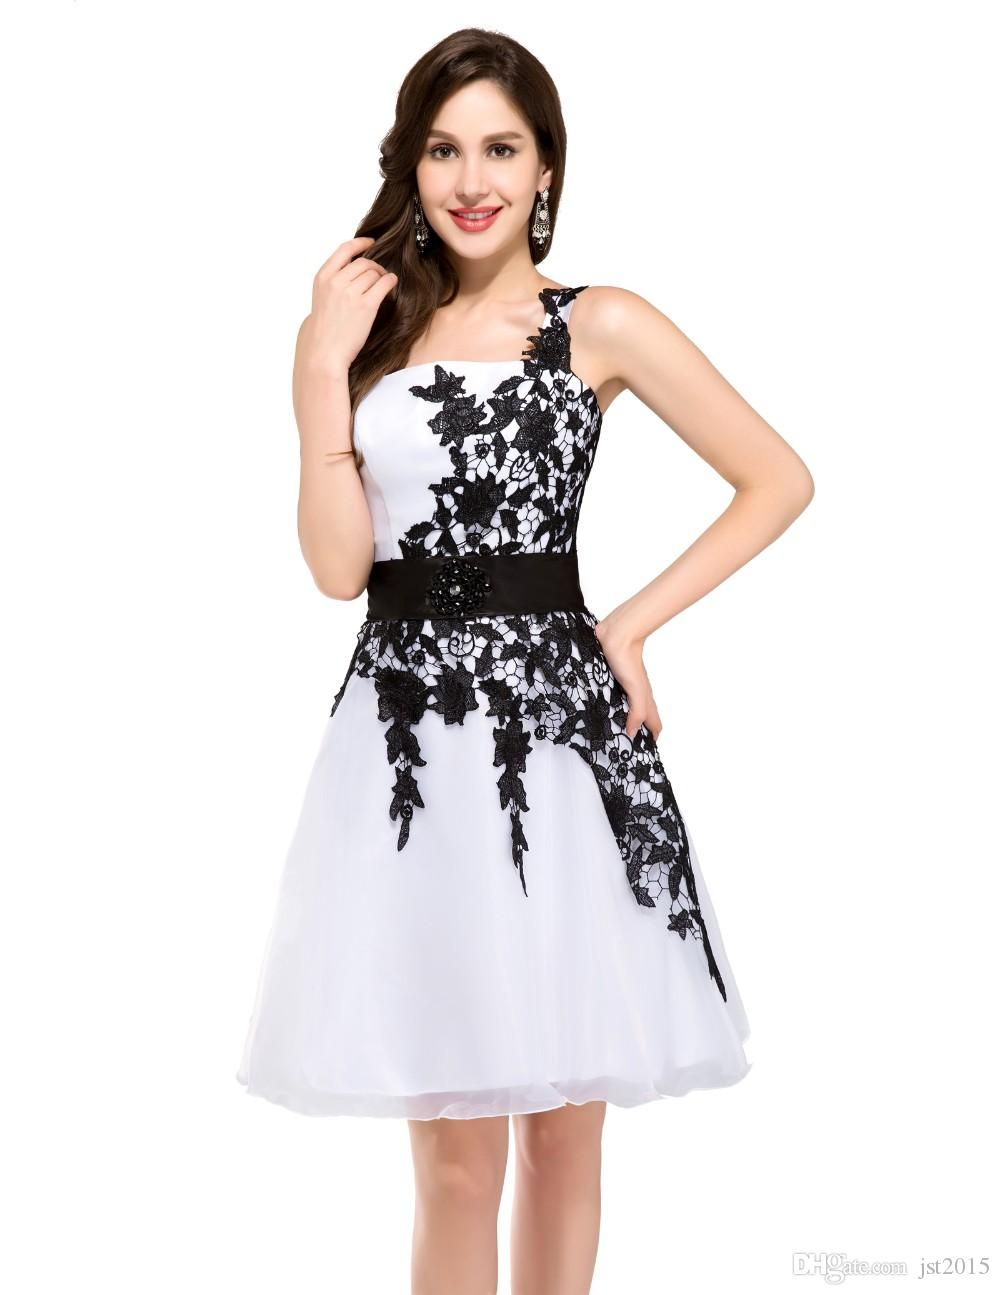 White Lace Cocktail Dresses Sexy One Shoulder Robe De Cocktail 2016 Karin Vestido Cocktel Short Cocktail Dress